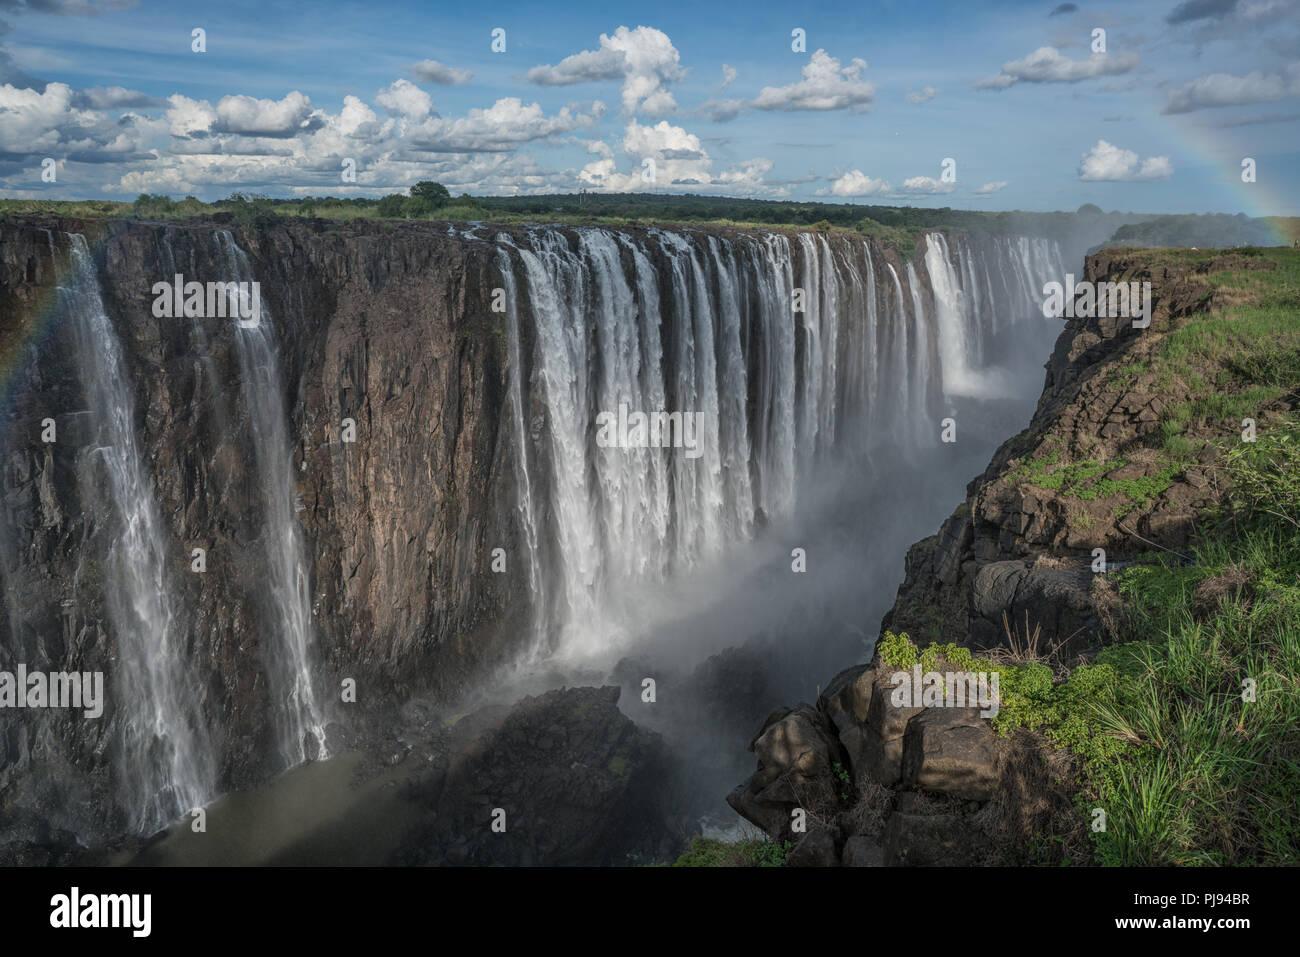 Les chutes sans fin, Victoria Falls, Zimbabwe Photo Stock